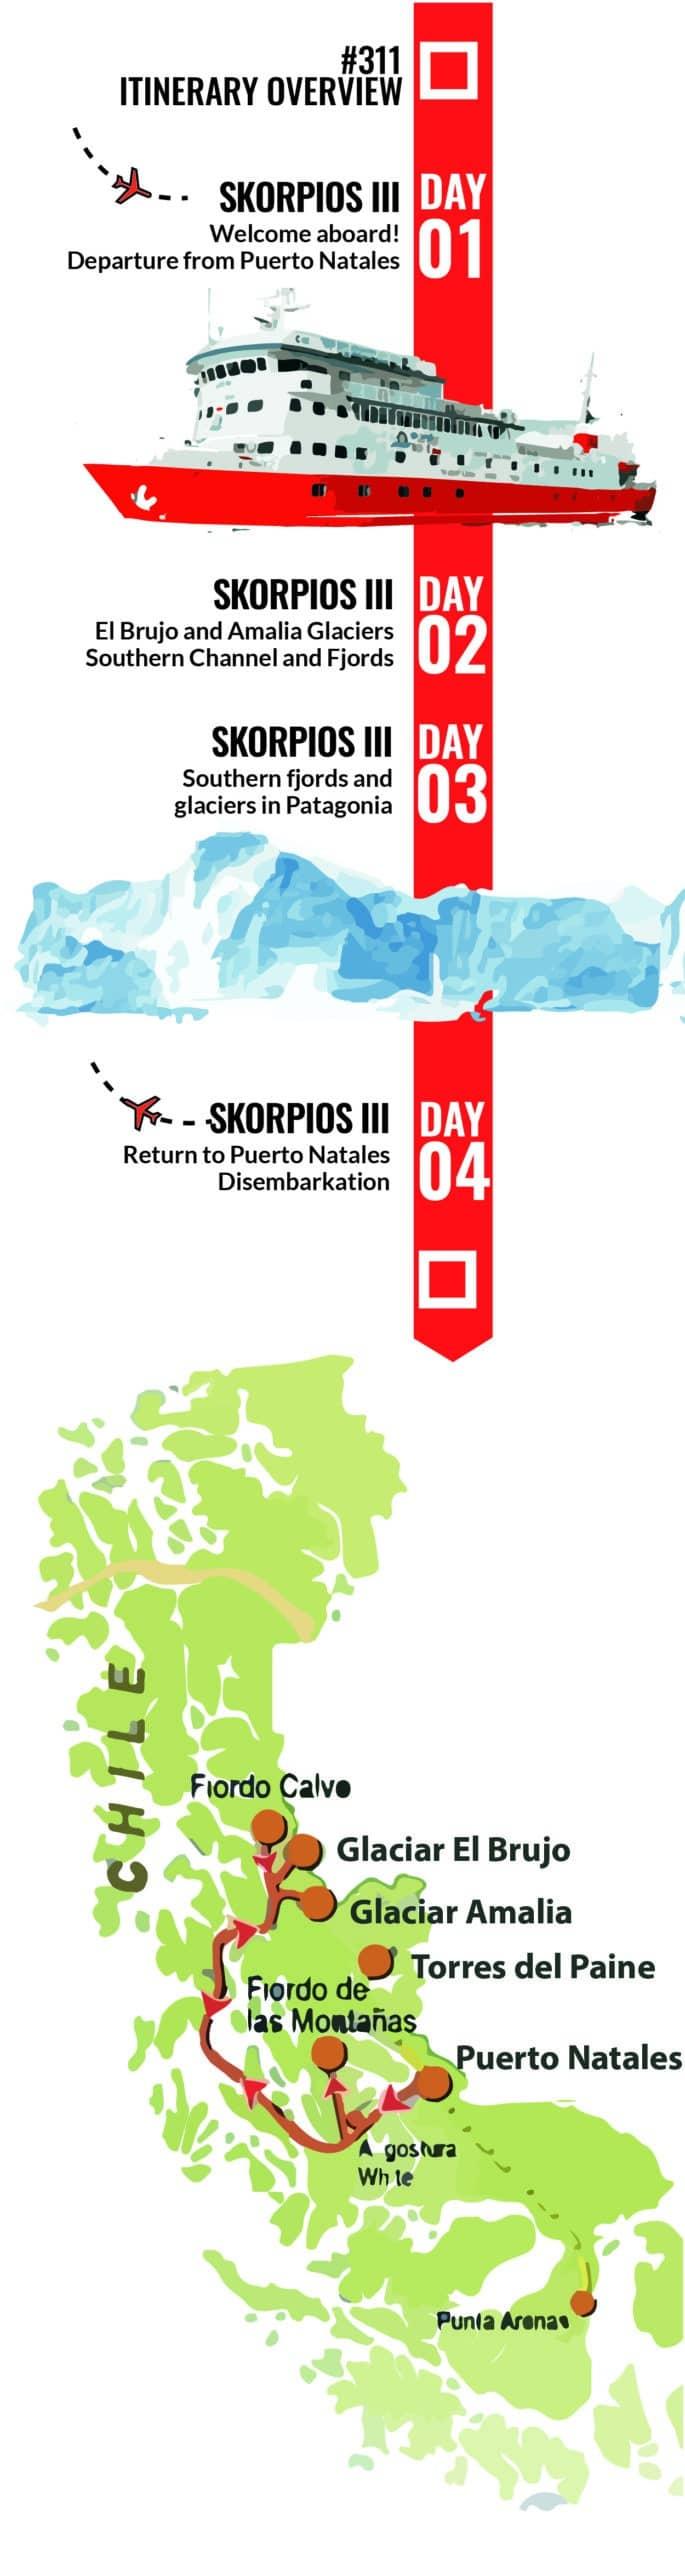 Skorpios III Cruise, Kaweskar Route by RipioTurismo DMC Argentina and Chile